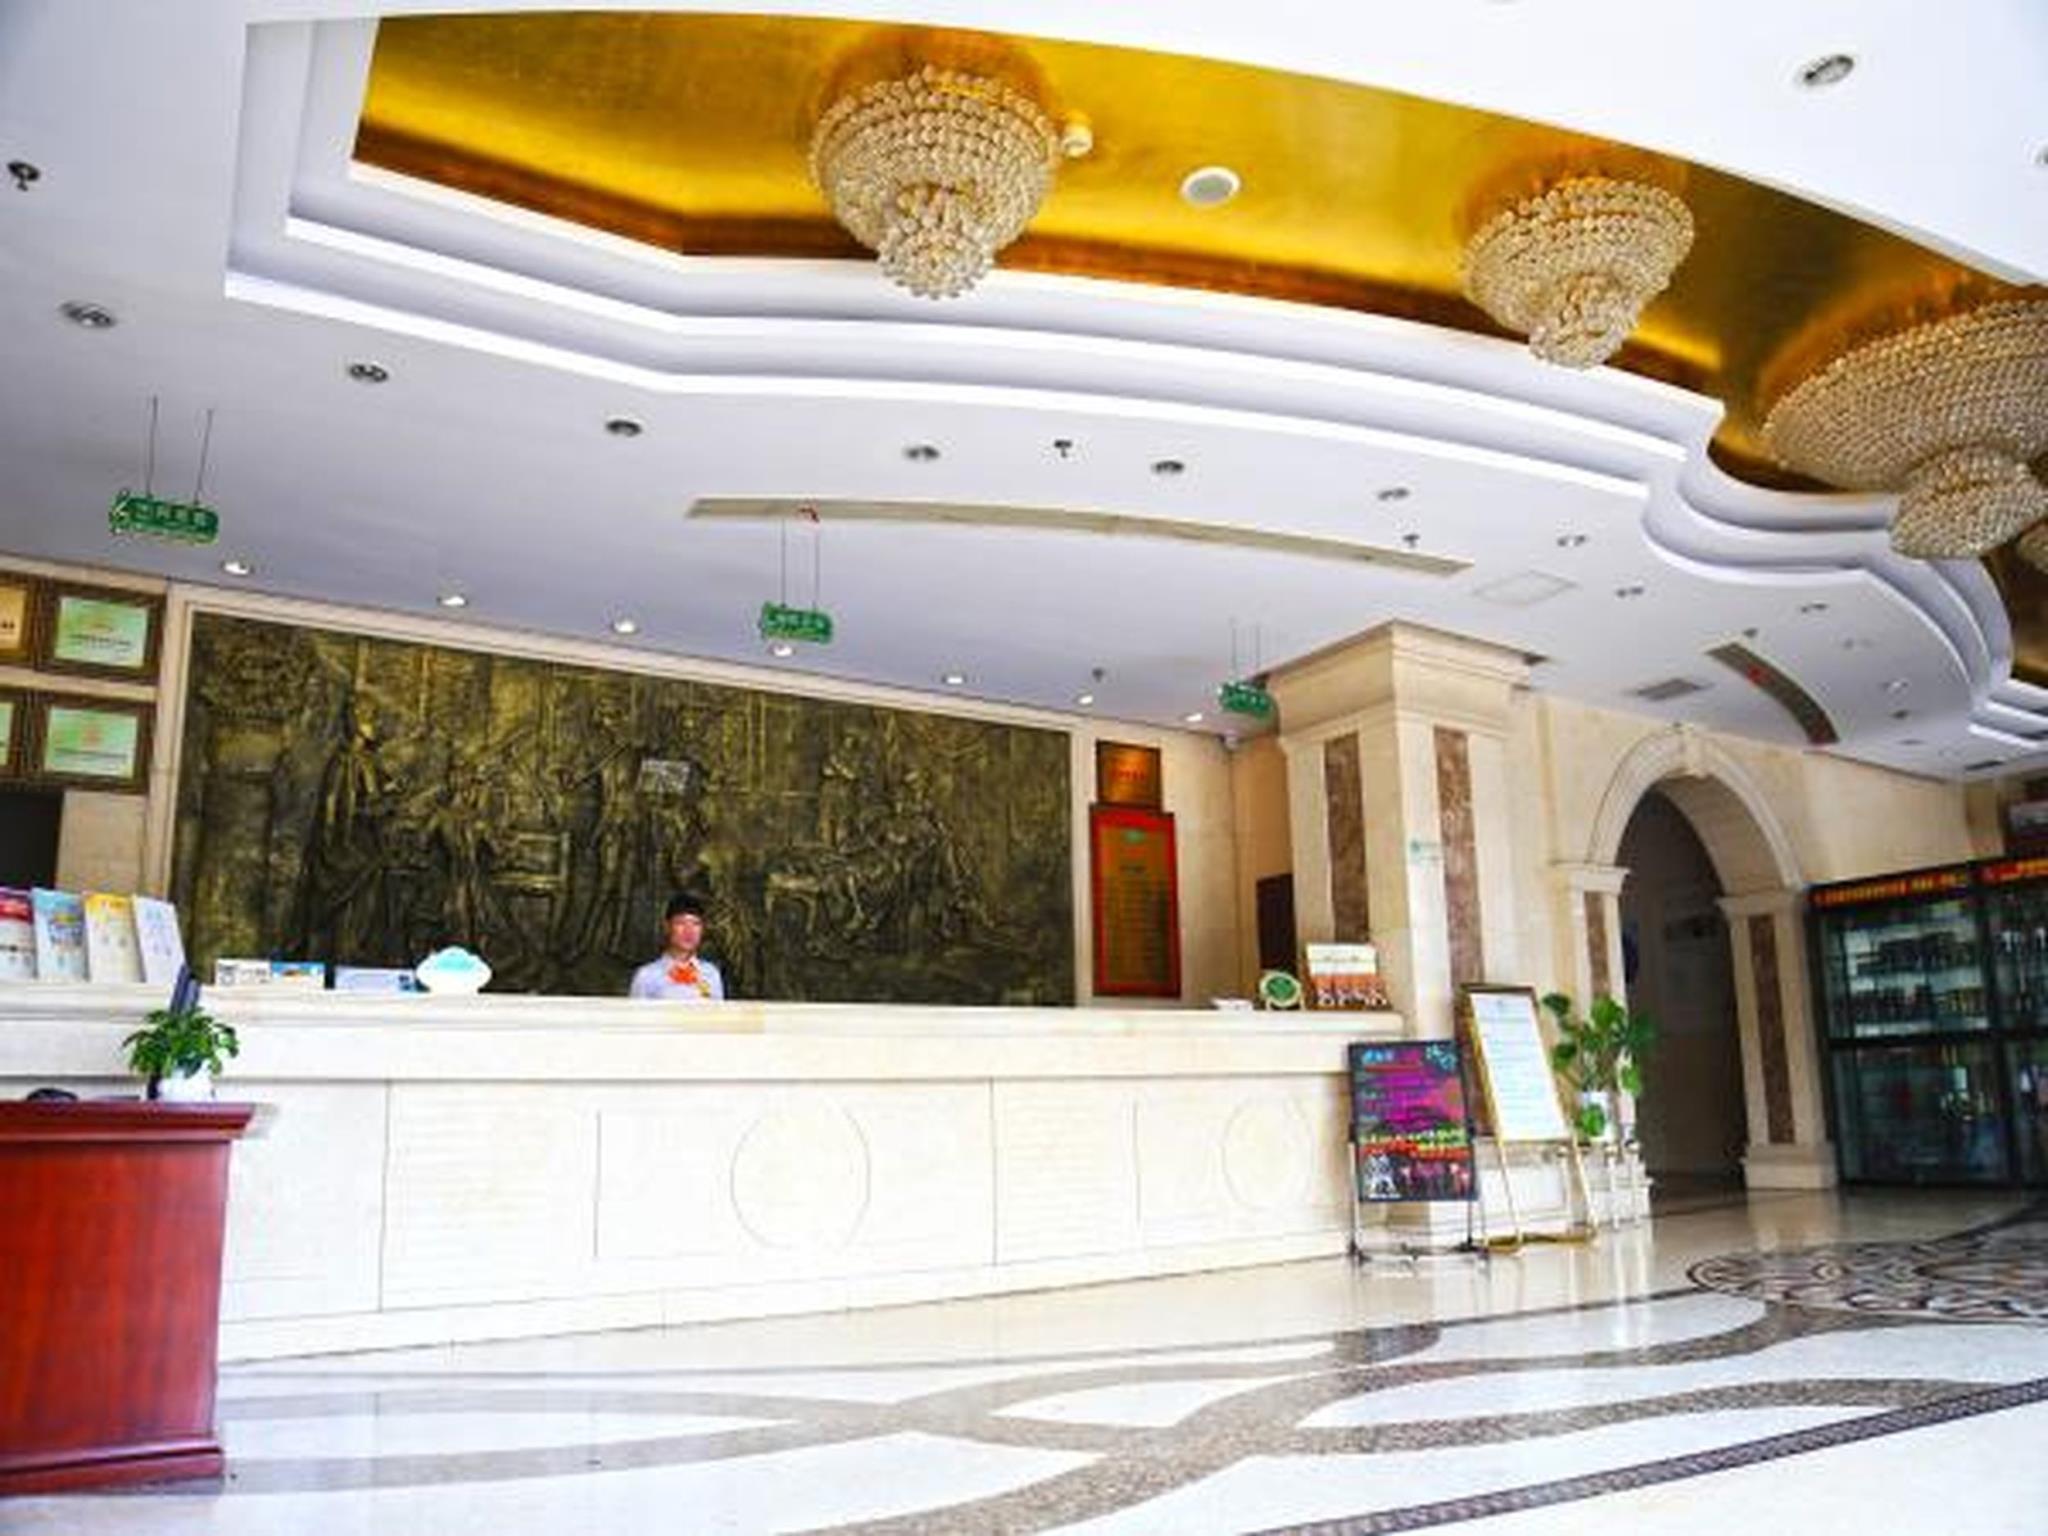 Vienna Hotel Suzhou Likou furniture city Branch